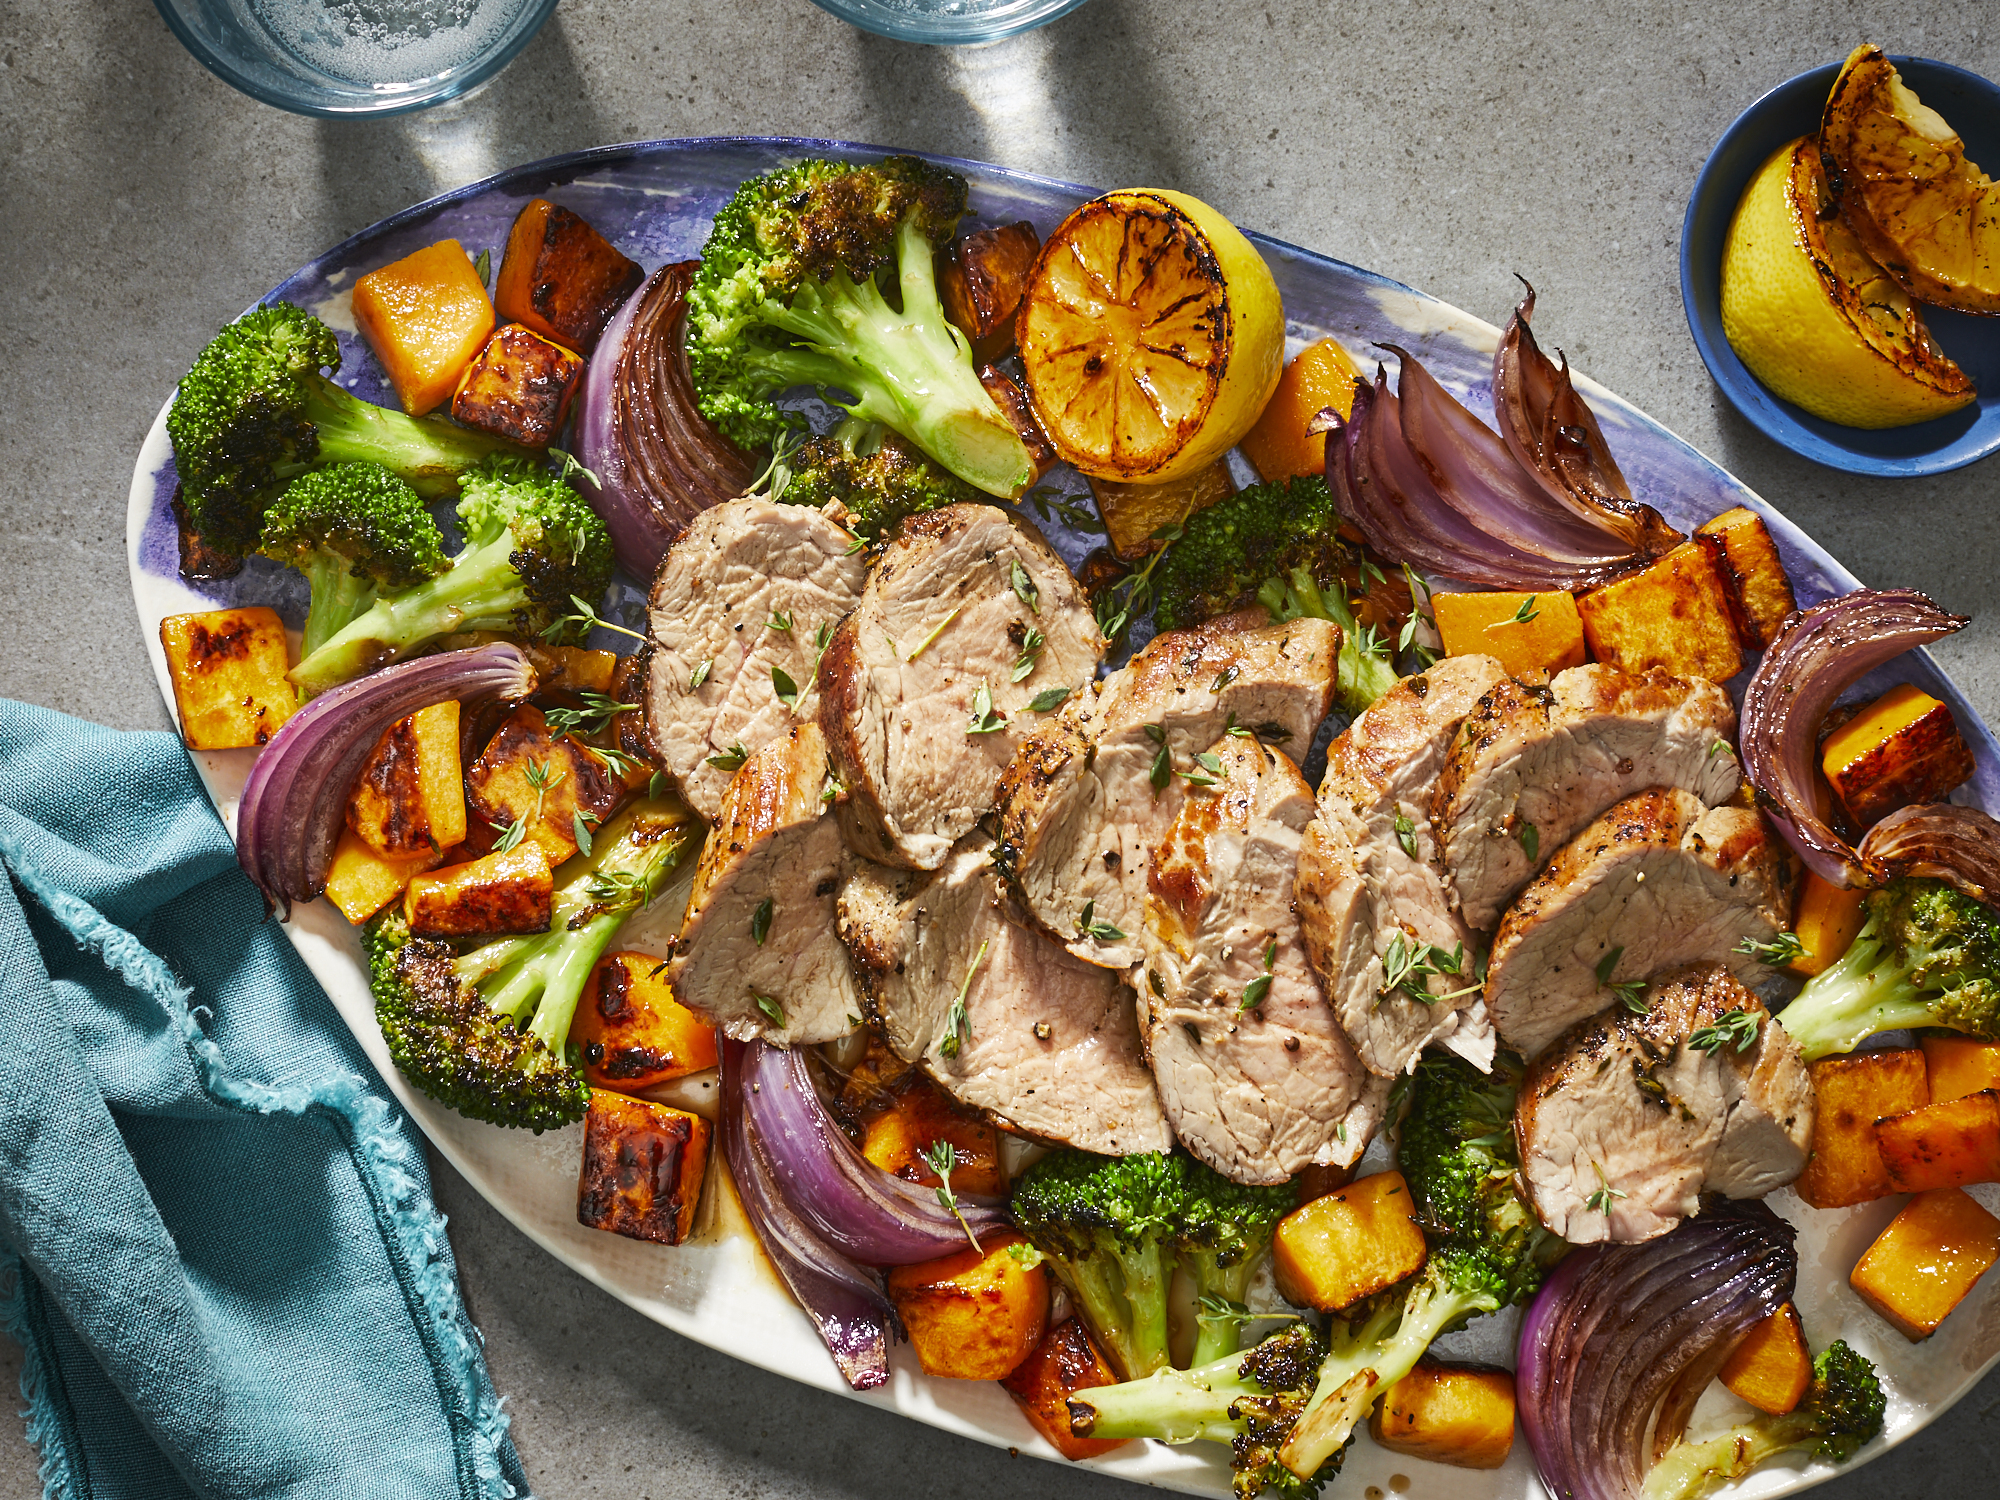 Sheet Pan Pork Tenderloin with Broccoli and Butternut Squash